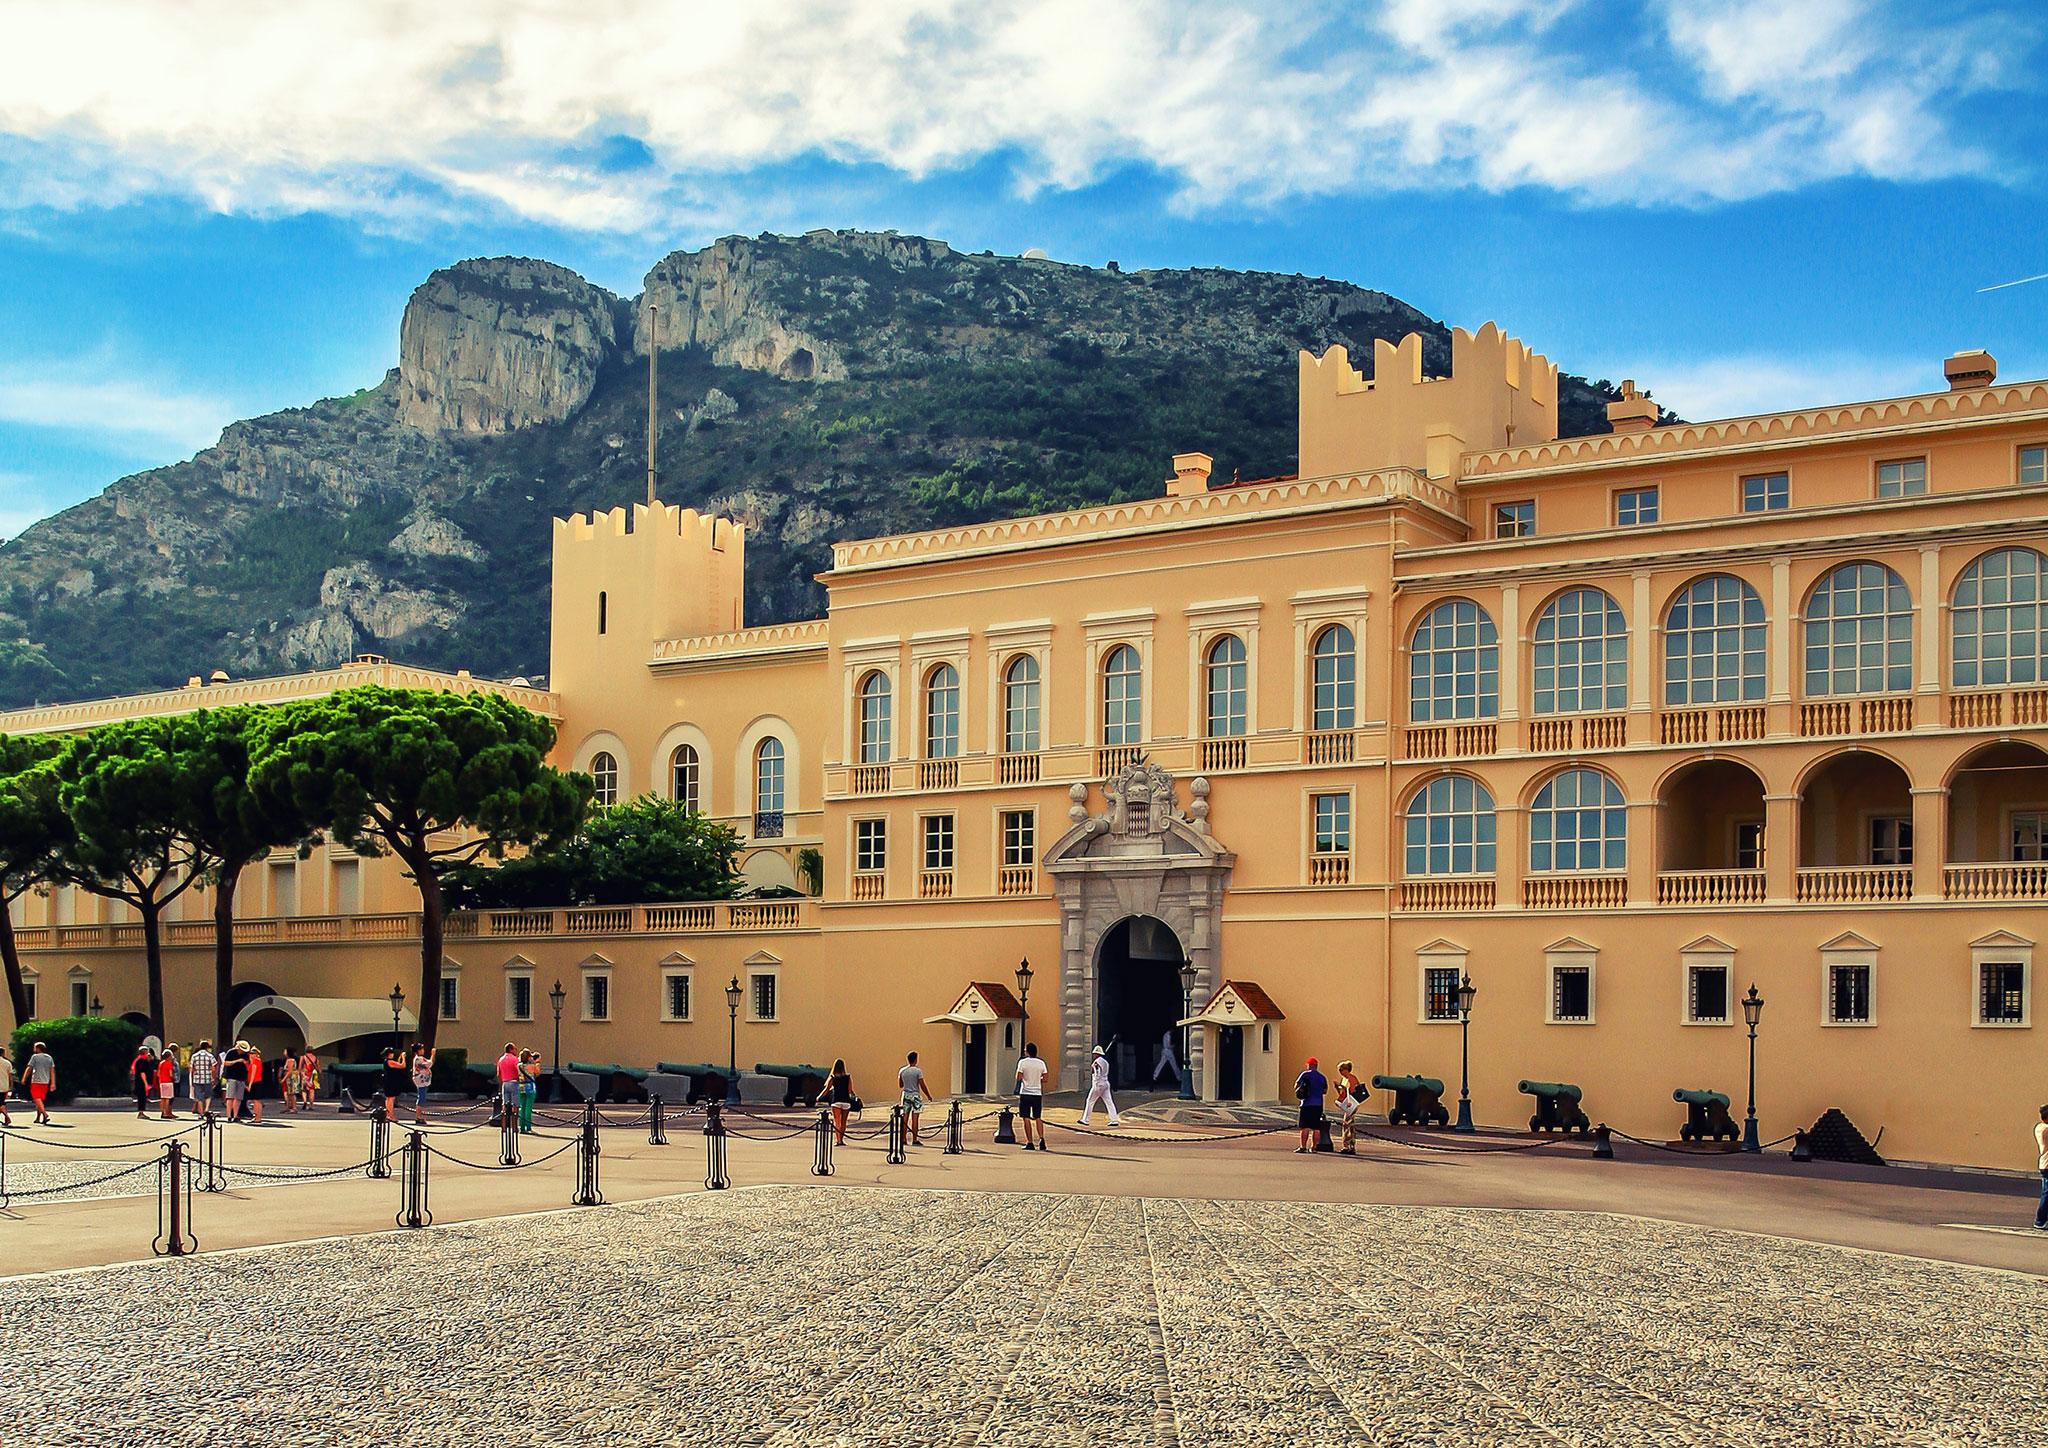 Prince's Palace of Monaco, Monaco